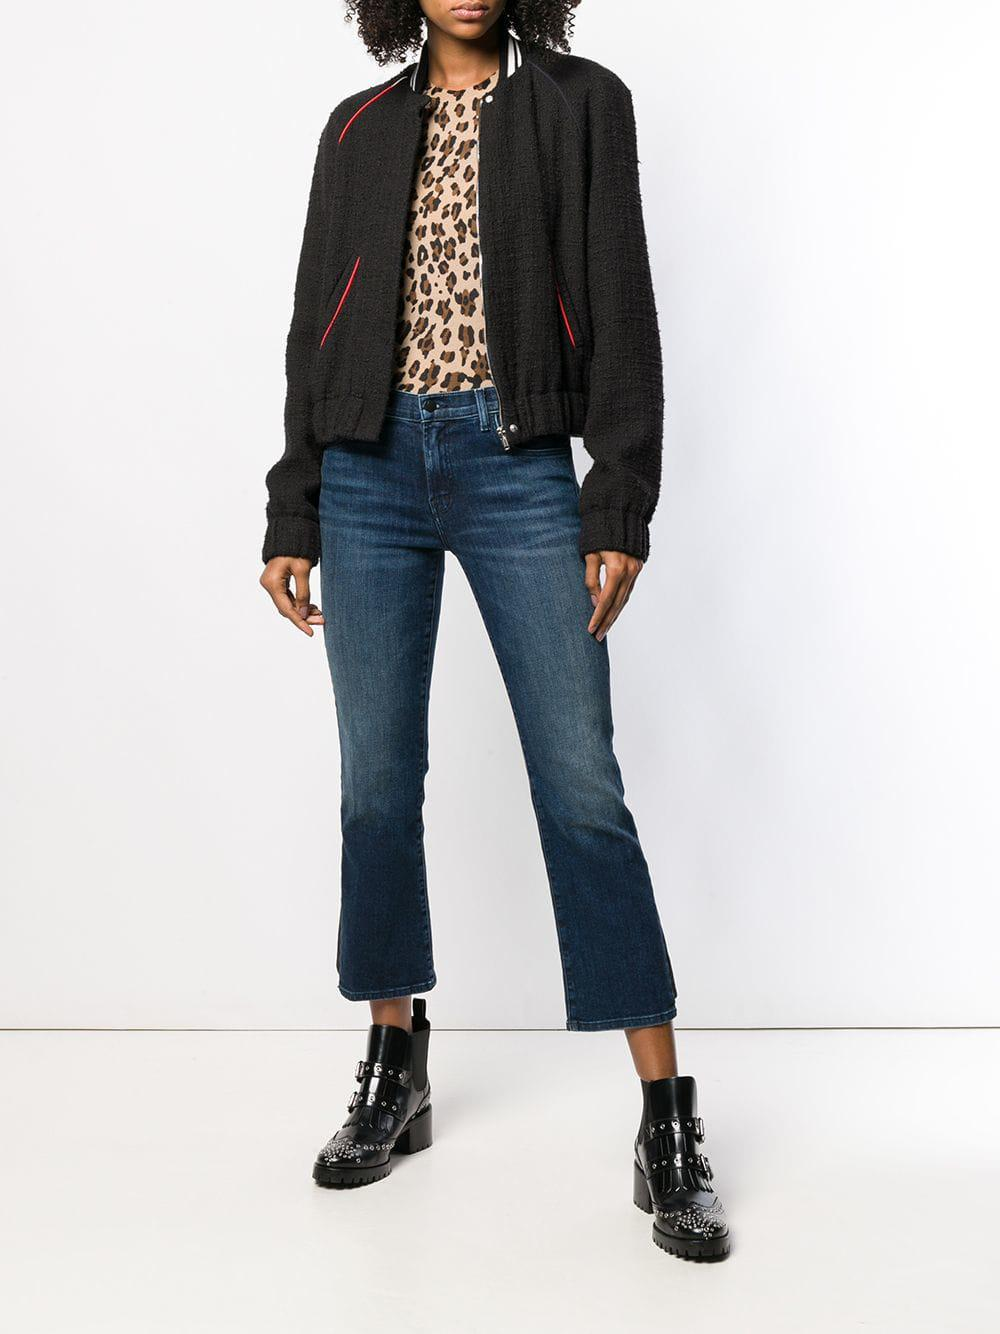 920d2067b37f Lyst - J Brand Classic Cropped Jeans in Blue